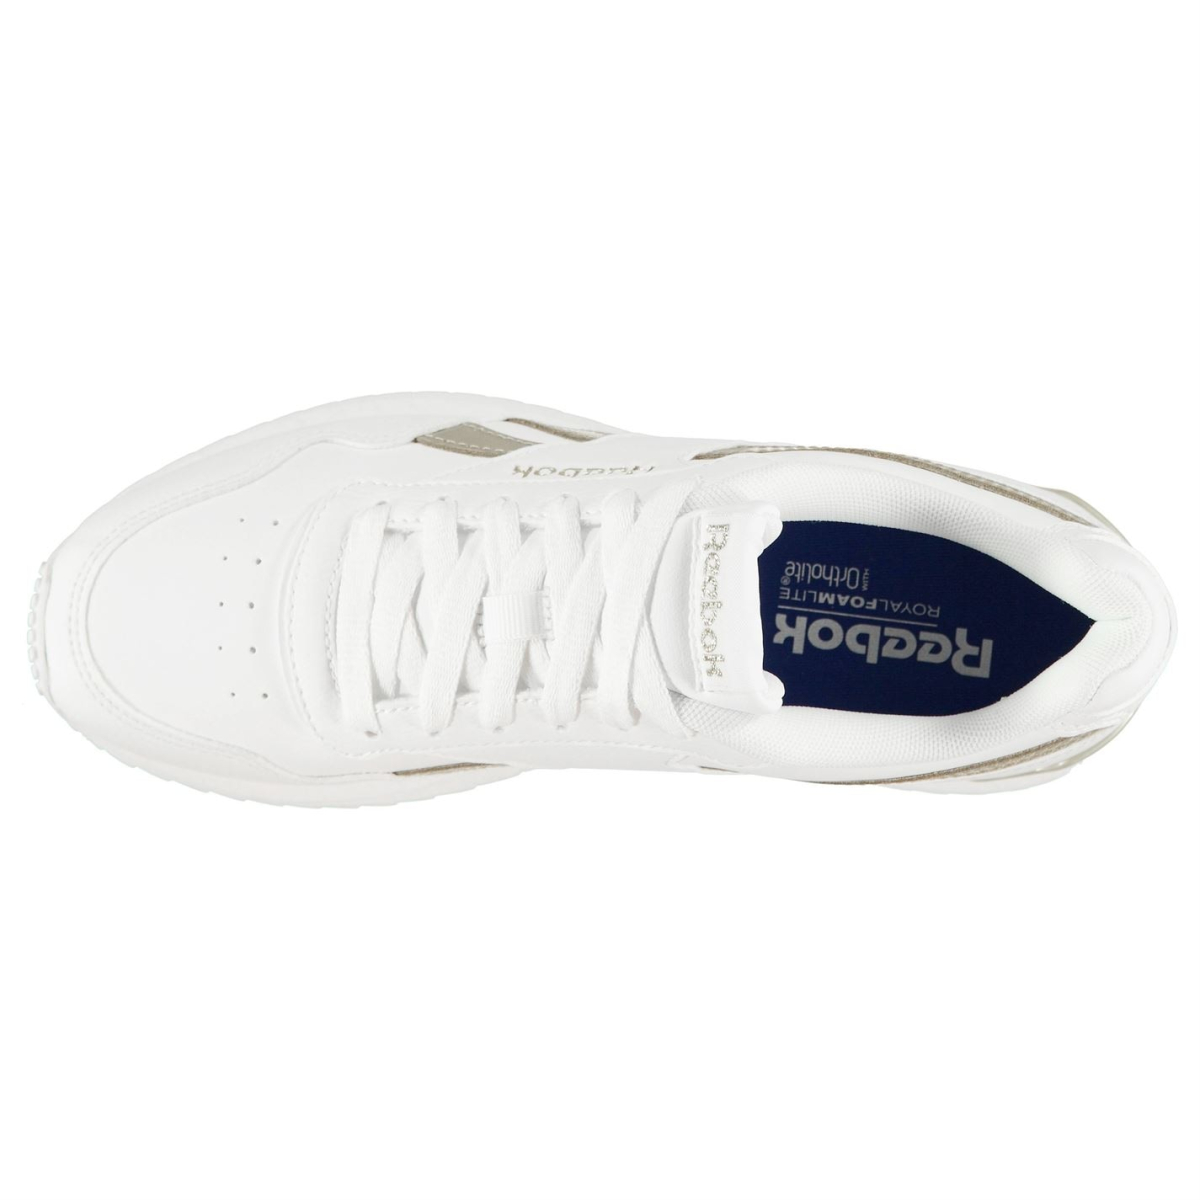 Reebok-Royal-Glide-Turnschuhe-Laufschuhe-Damen-Sneaker-Trainers-Sportschuhe-8001 Indexbild 4